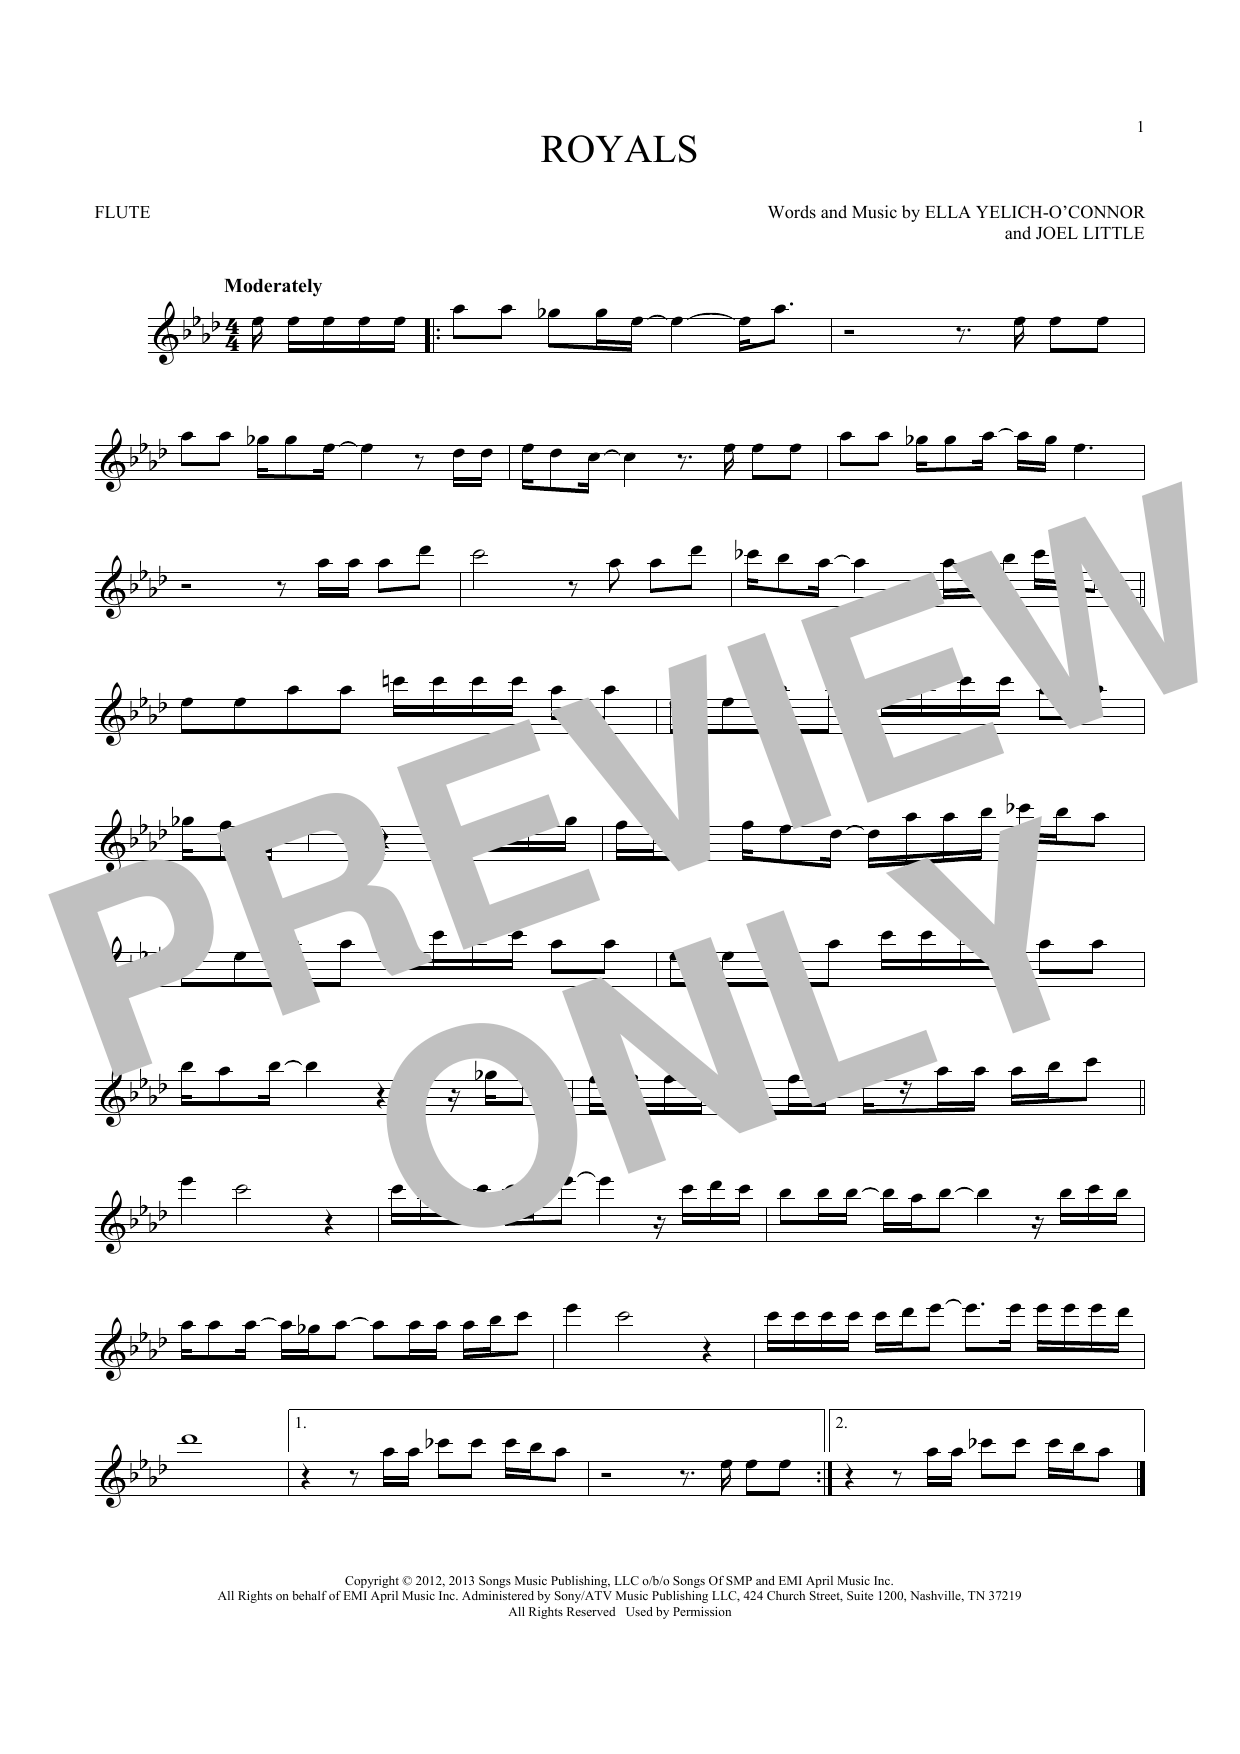 Royals (Flute Solo)